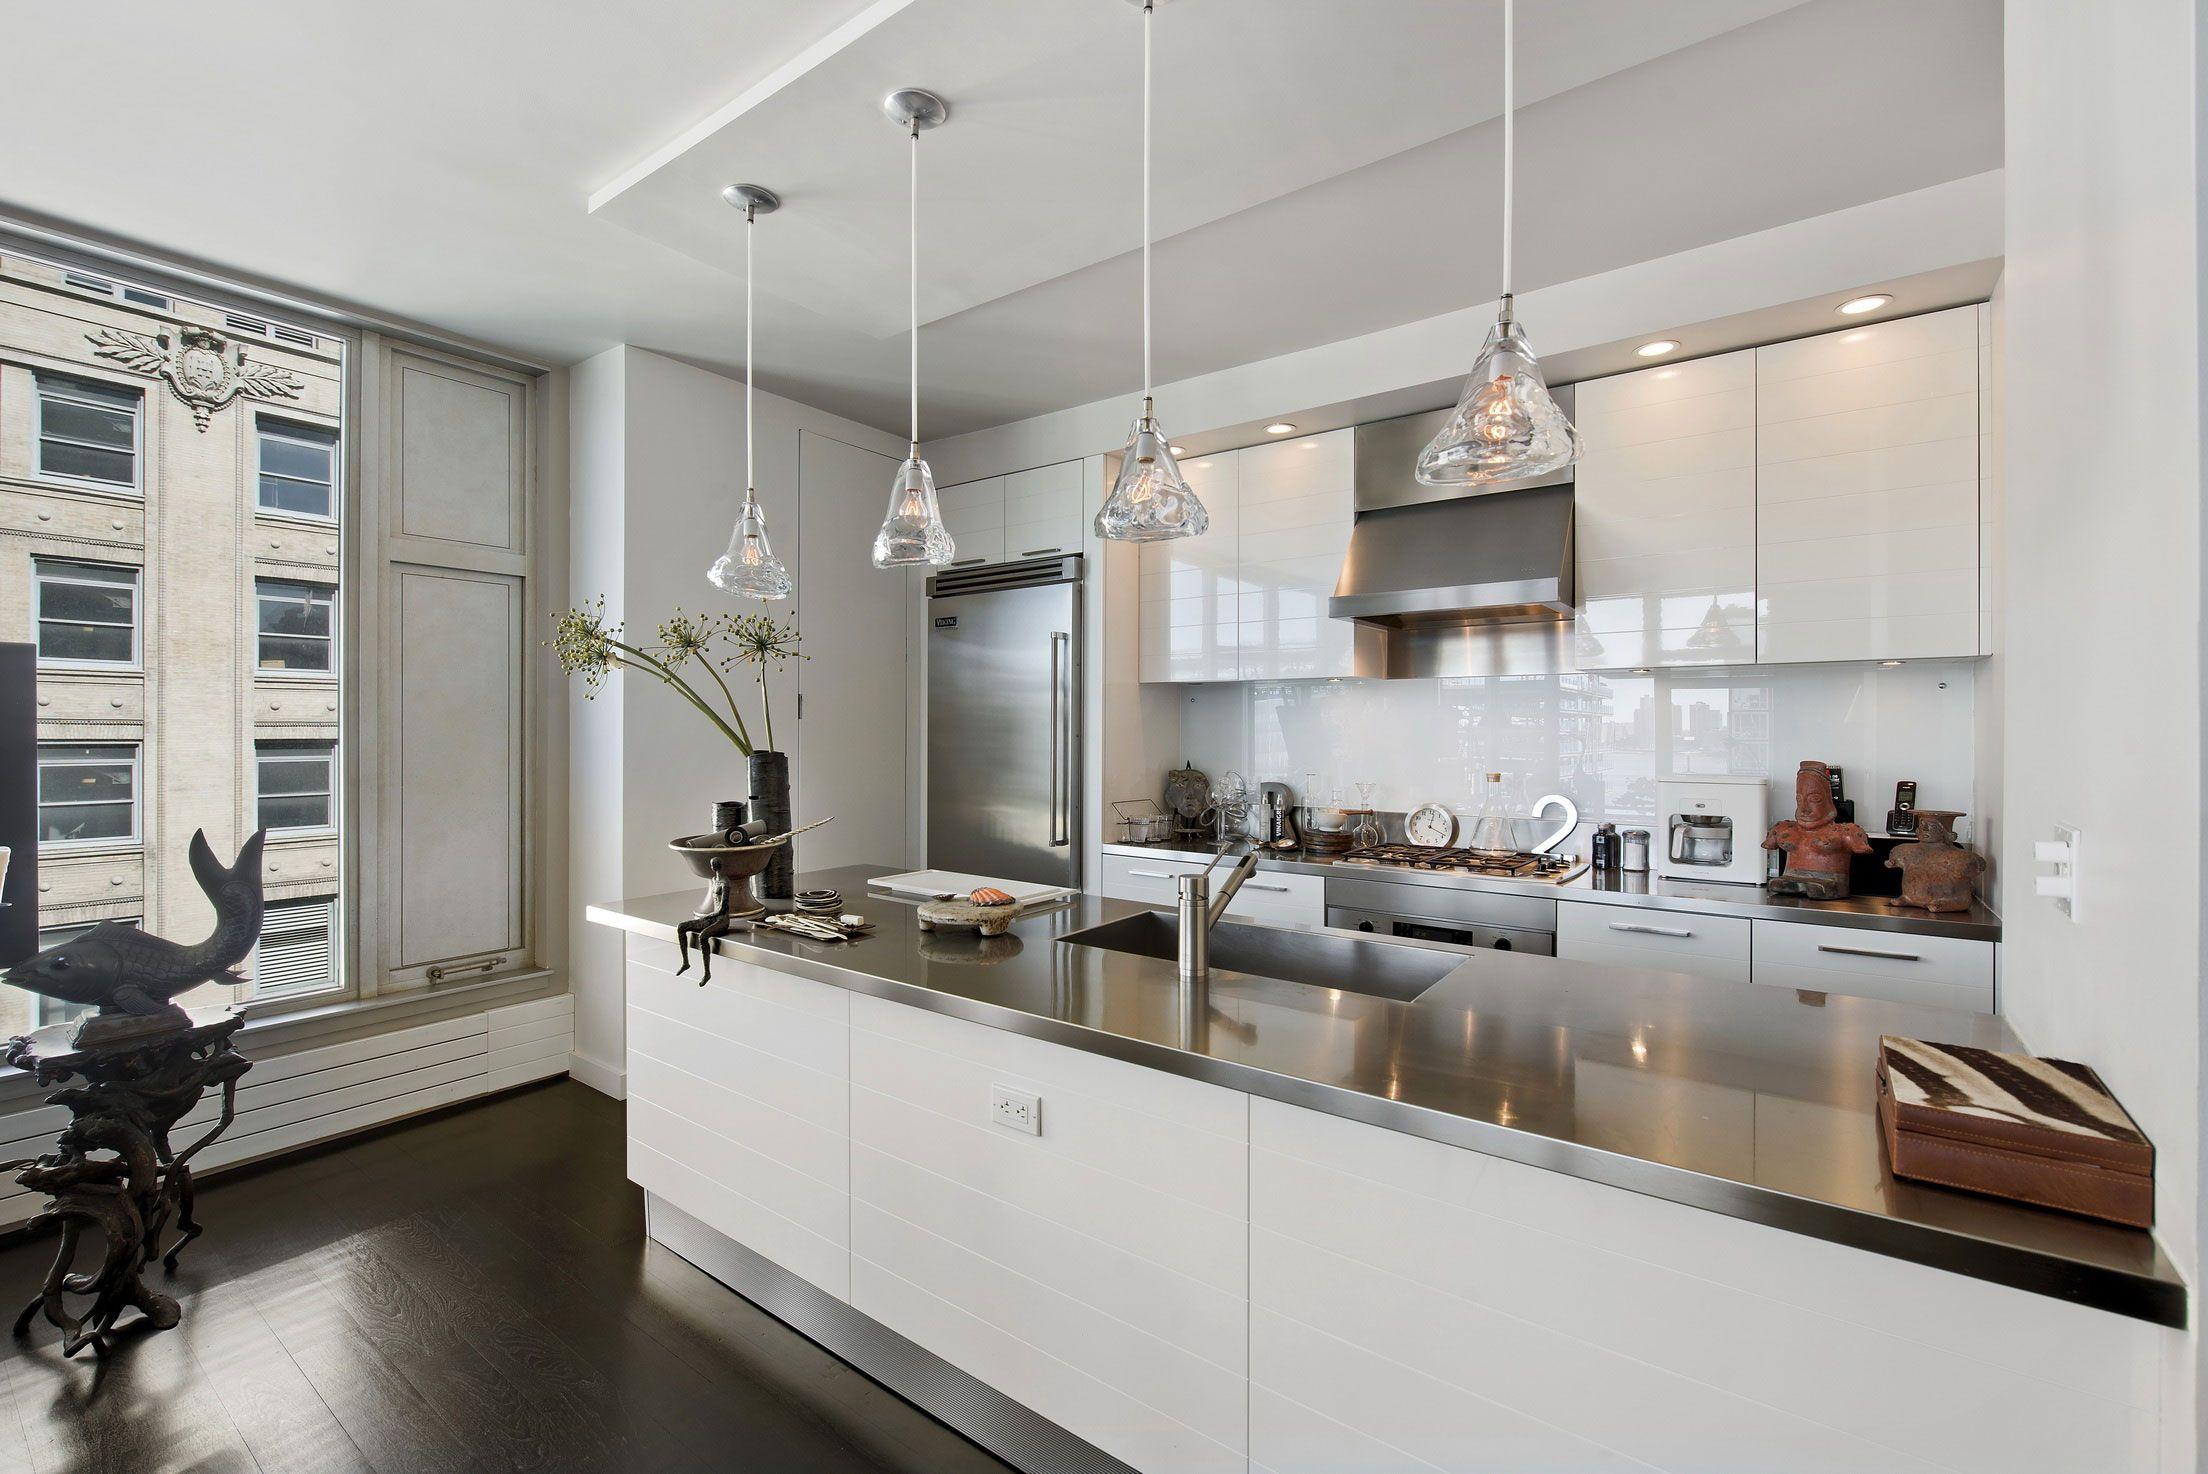 Irdizains  Galerija  Design Ideas  Pinterest Pleasing Modern Kitchen Cabinets Nyc Decorating Inspiration